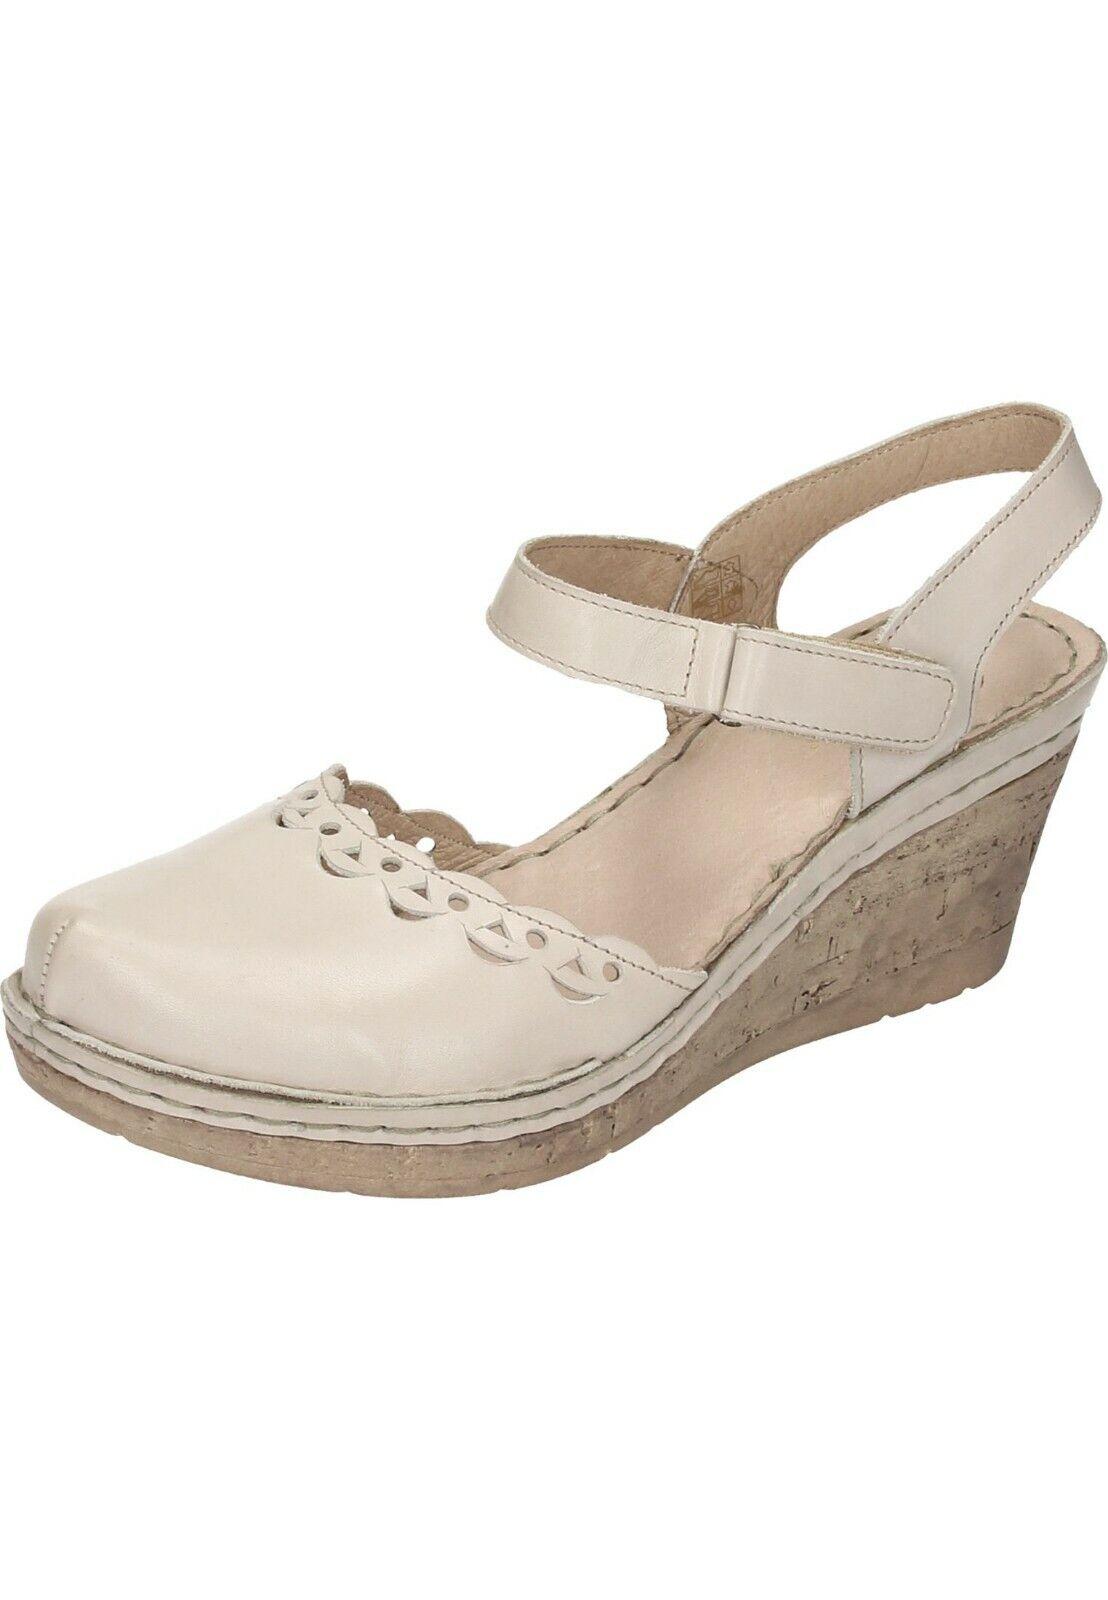 Manitu Sandales Cuir femmes chaussures Avec Talon Compense 35-42 910778 -8 Offblanc neu29